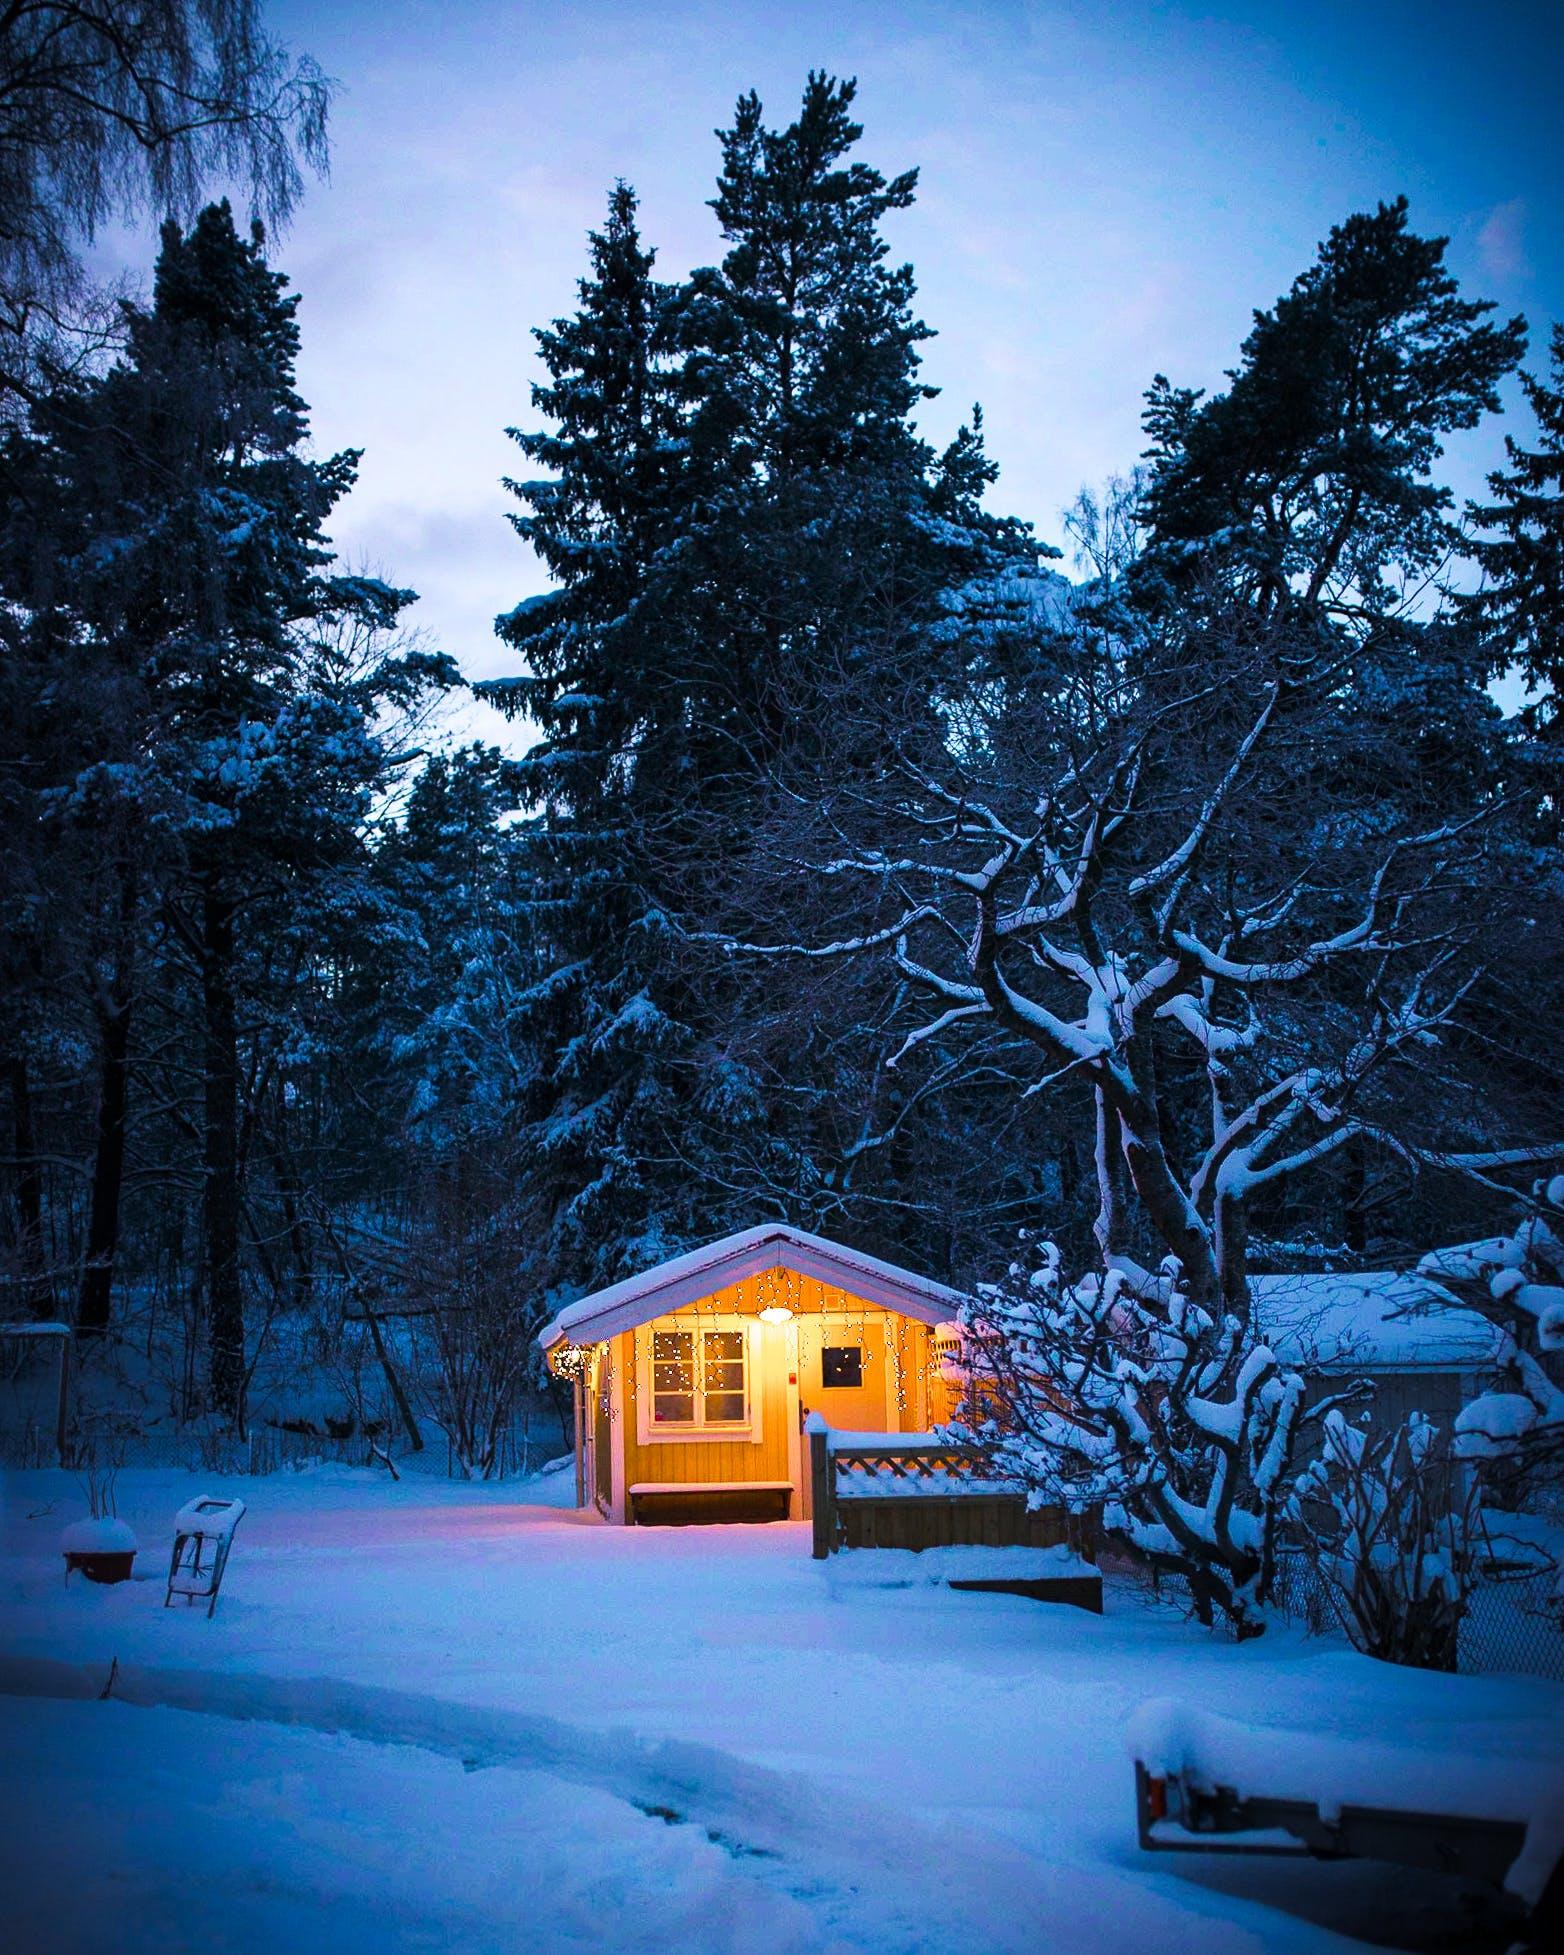 Free stock photo of cottage, cozy, dusk, snow